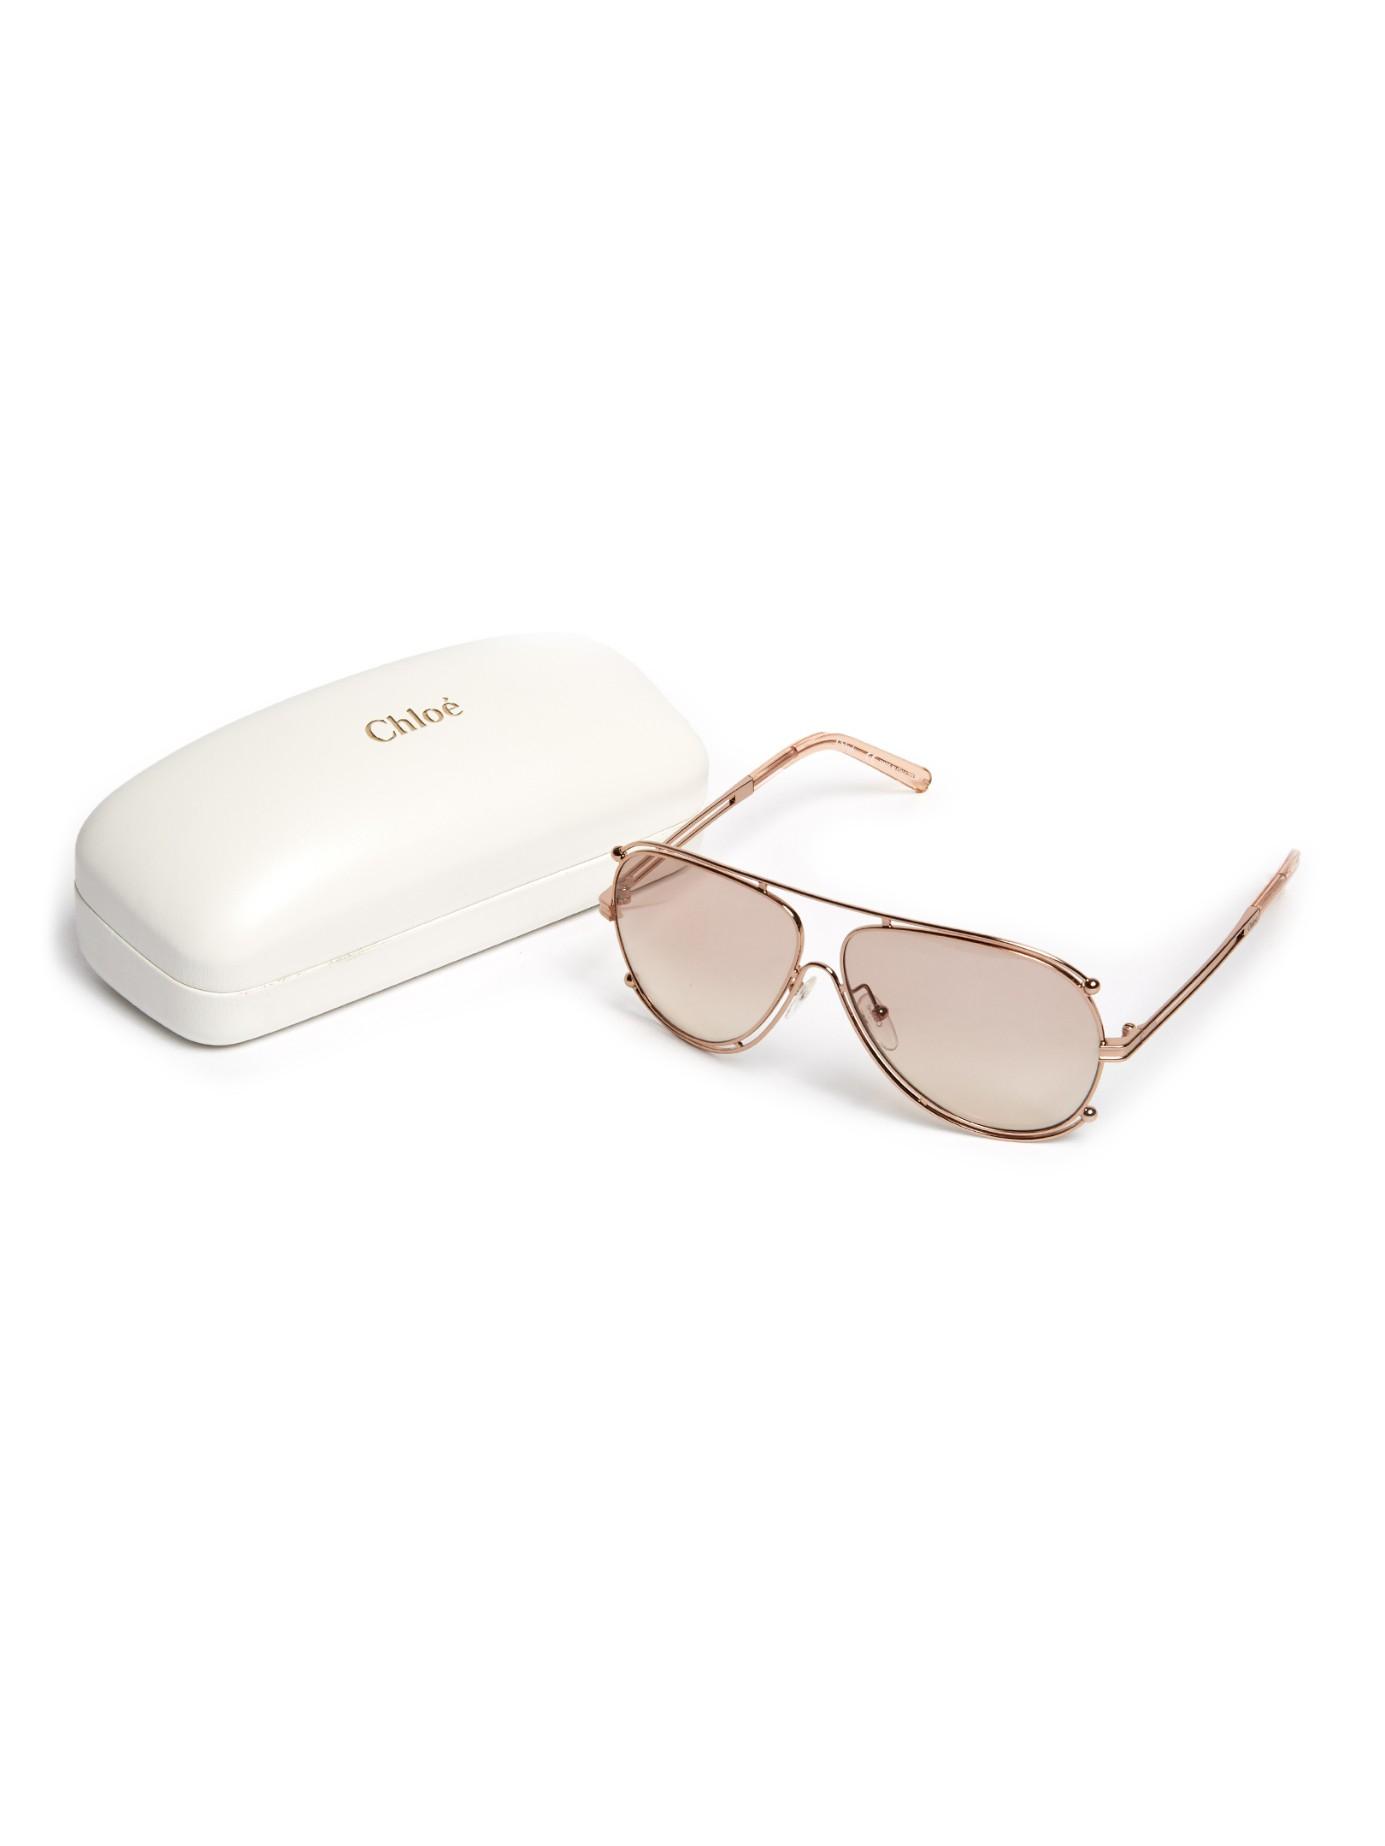 62b03c2a8de99 Chloé Isidora Aviator Sunglasses in Pink - Lyst